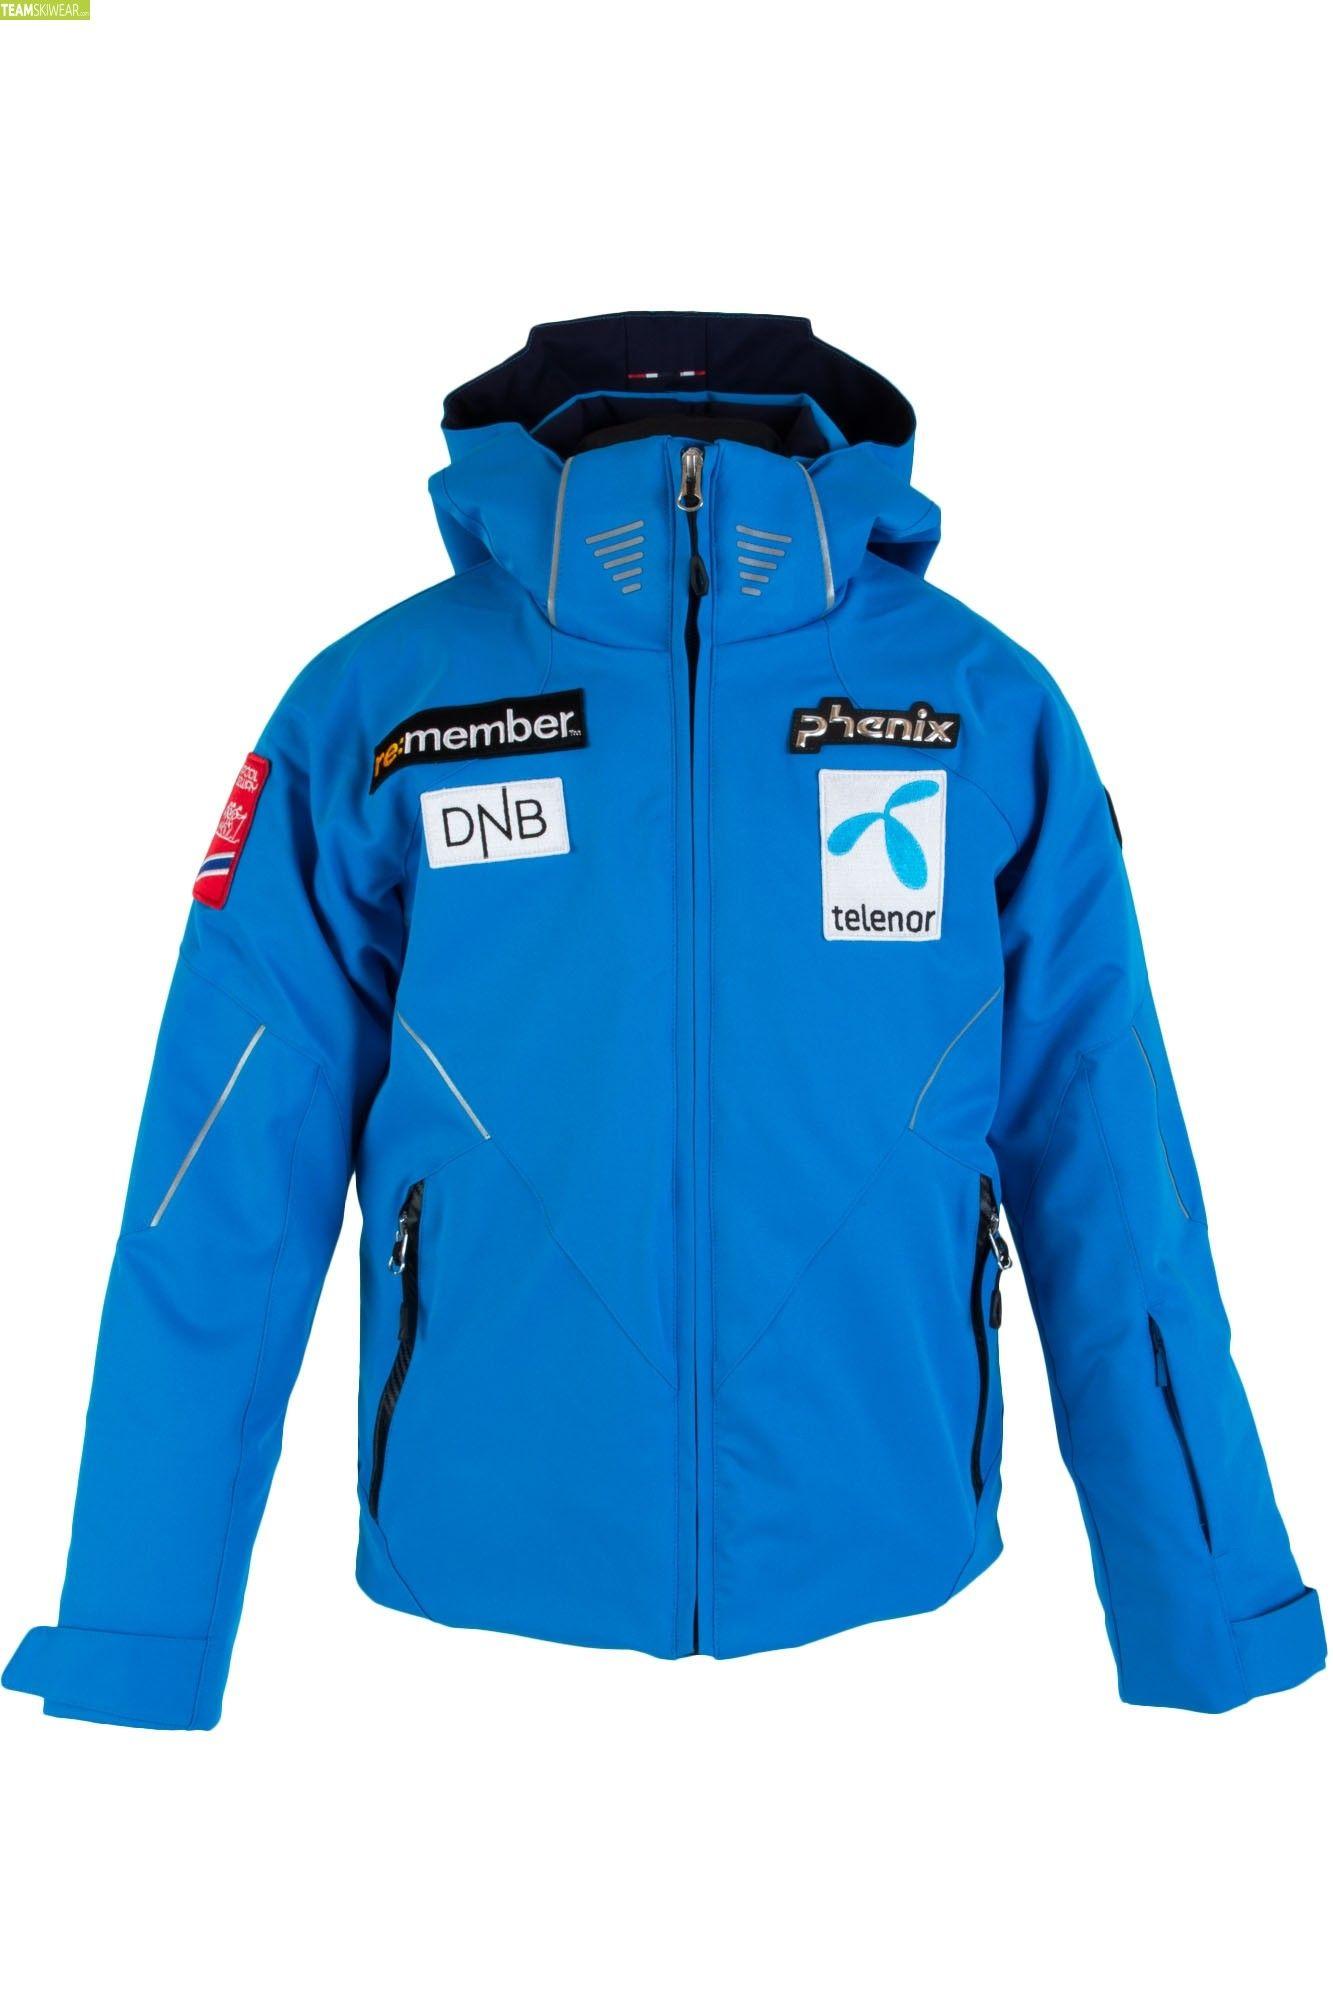 Phenix Junior Norway Ski Team Jacket | Ropa esqui, Ropa